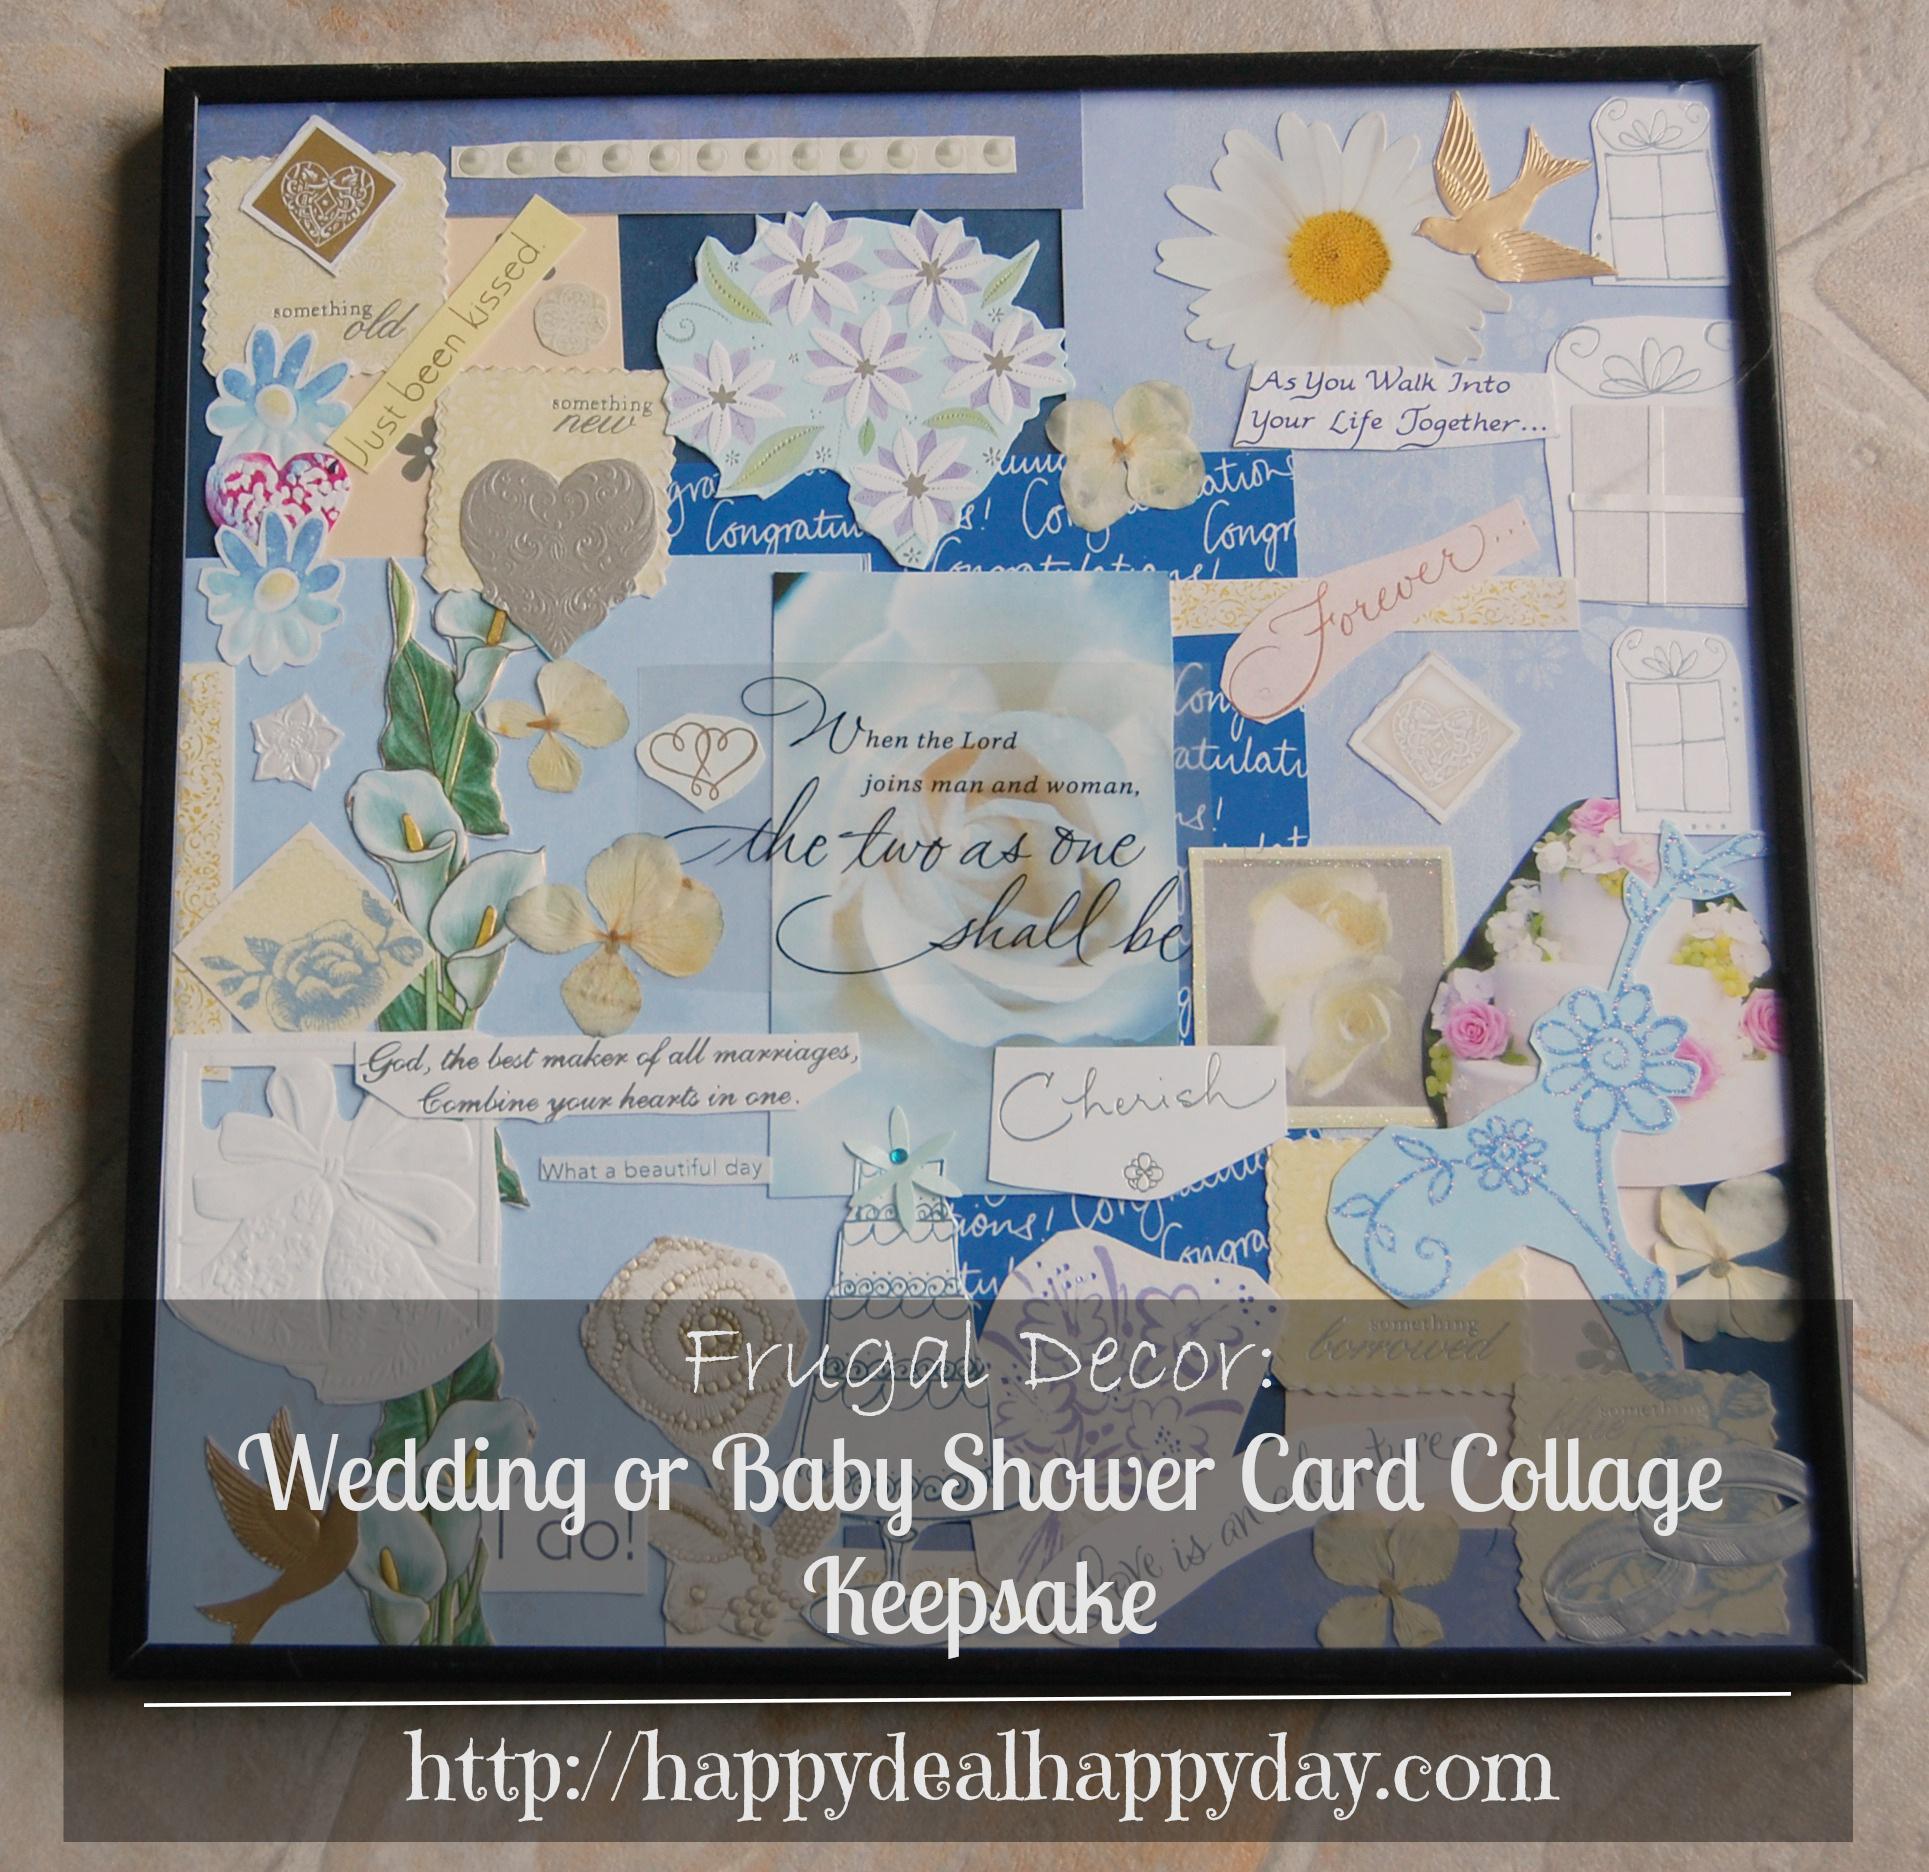 Frugal Decor:  Wedding or Baby Shower Card Collage Keepsake